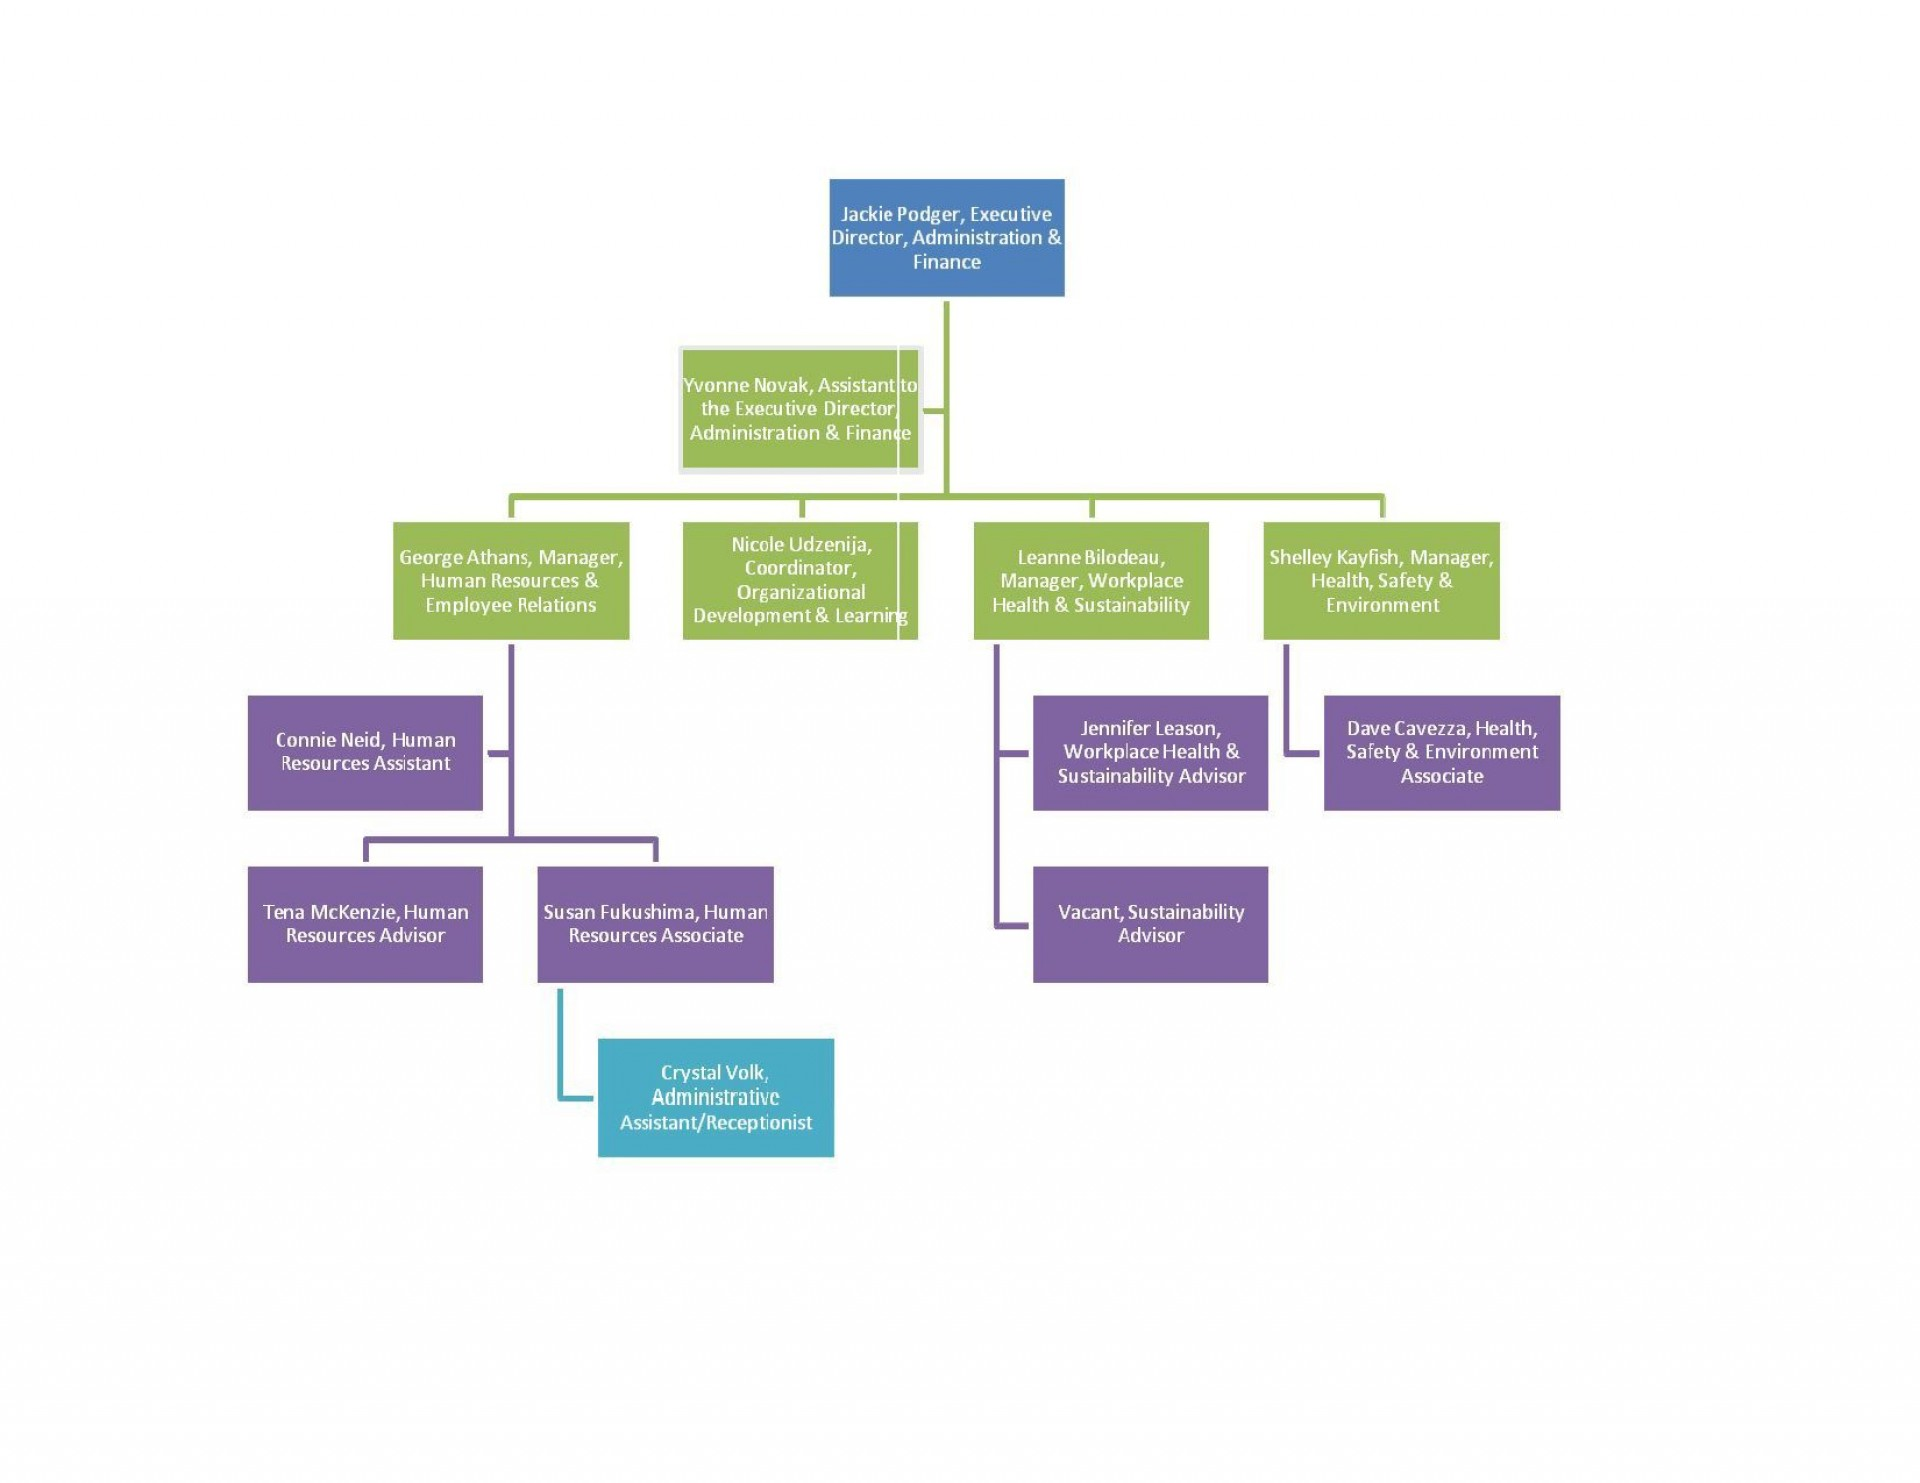 000 Beautiful Organization Chart Template Word 2013 Highest Clarity  Organizational Free Microsoft1920